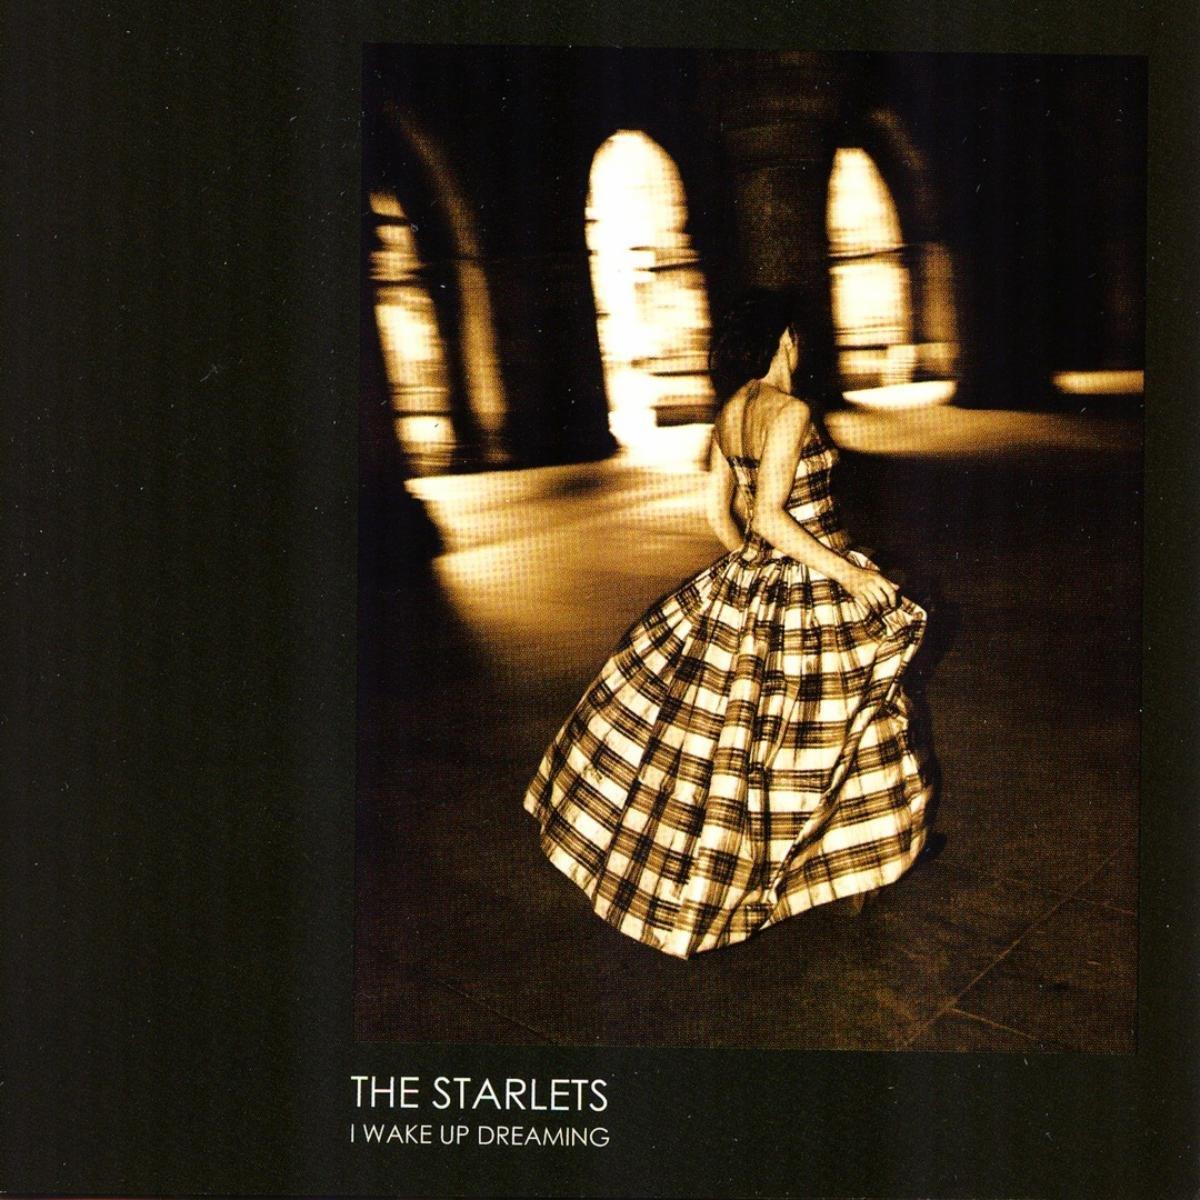 The Starlets – I Wake Up Dreaming (2009) [FLAC]